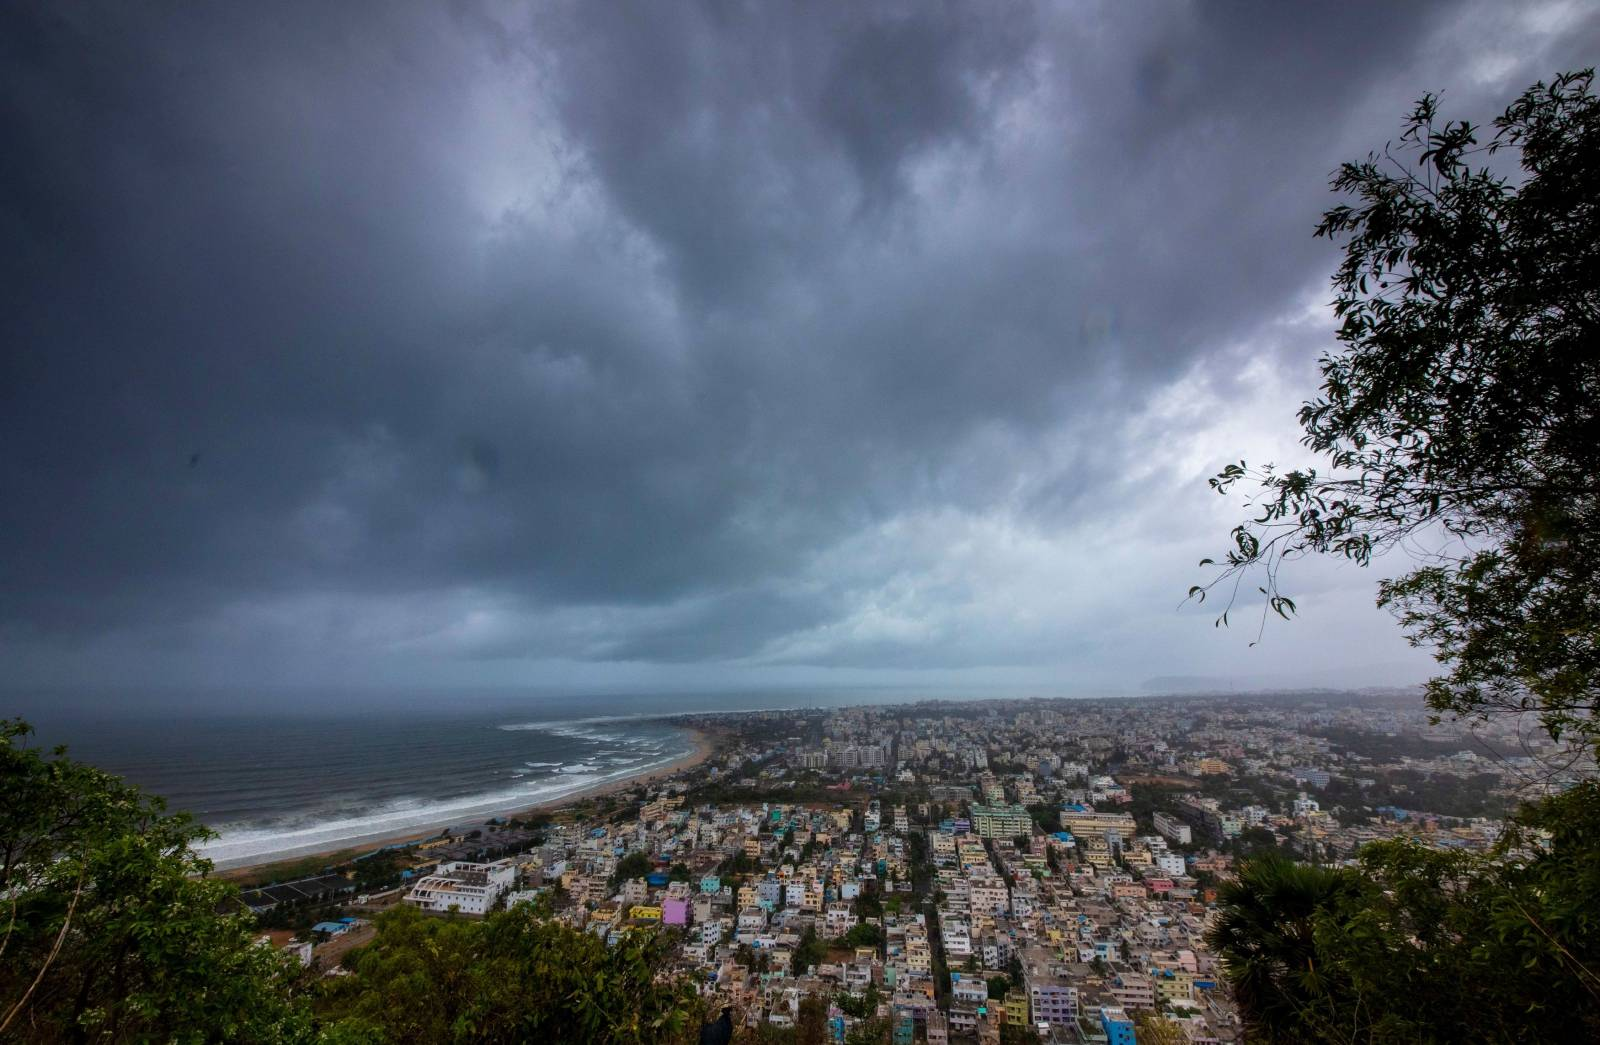 Clouds loom ahead of cyclone Fani in Visakhapatnam